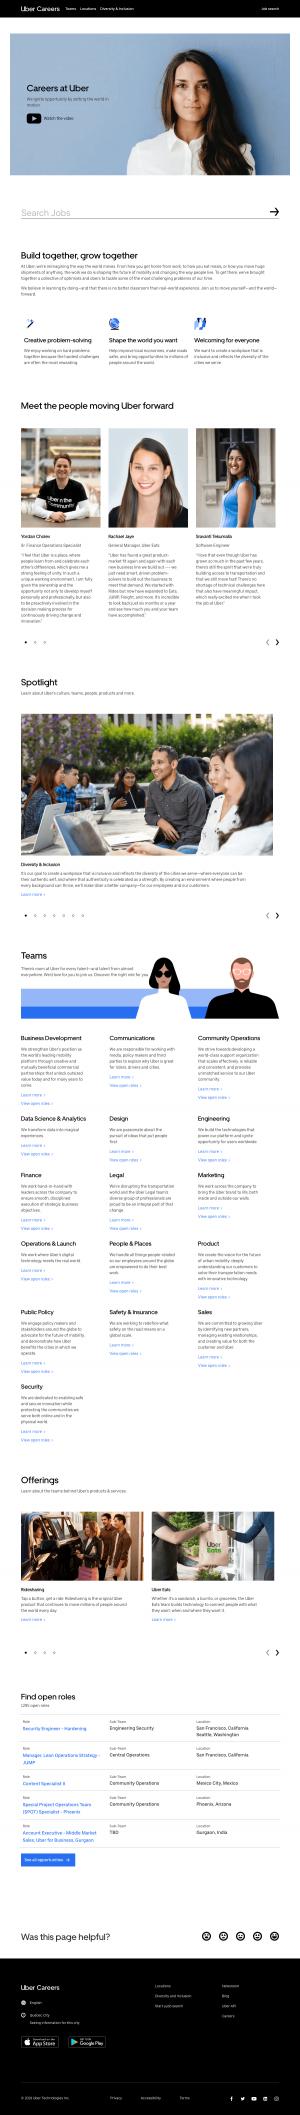 Career page - Uber